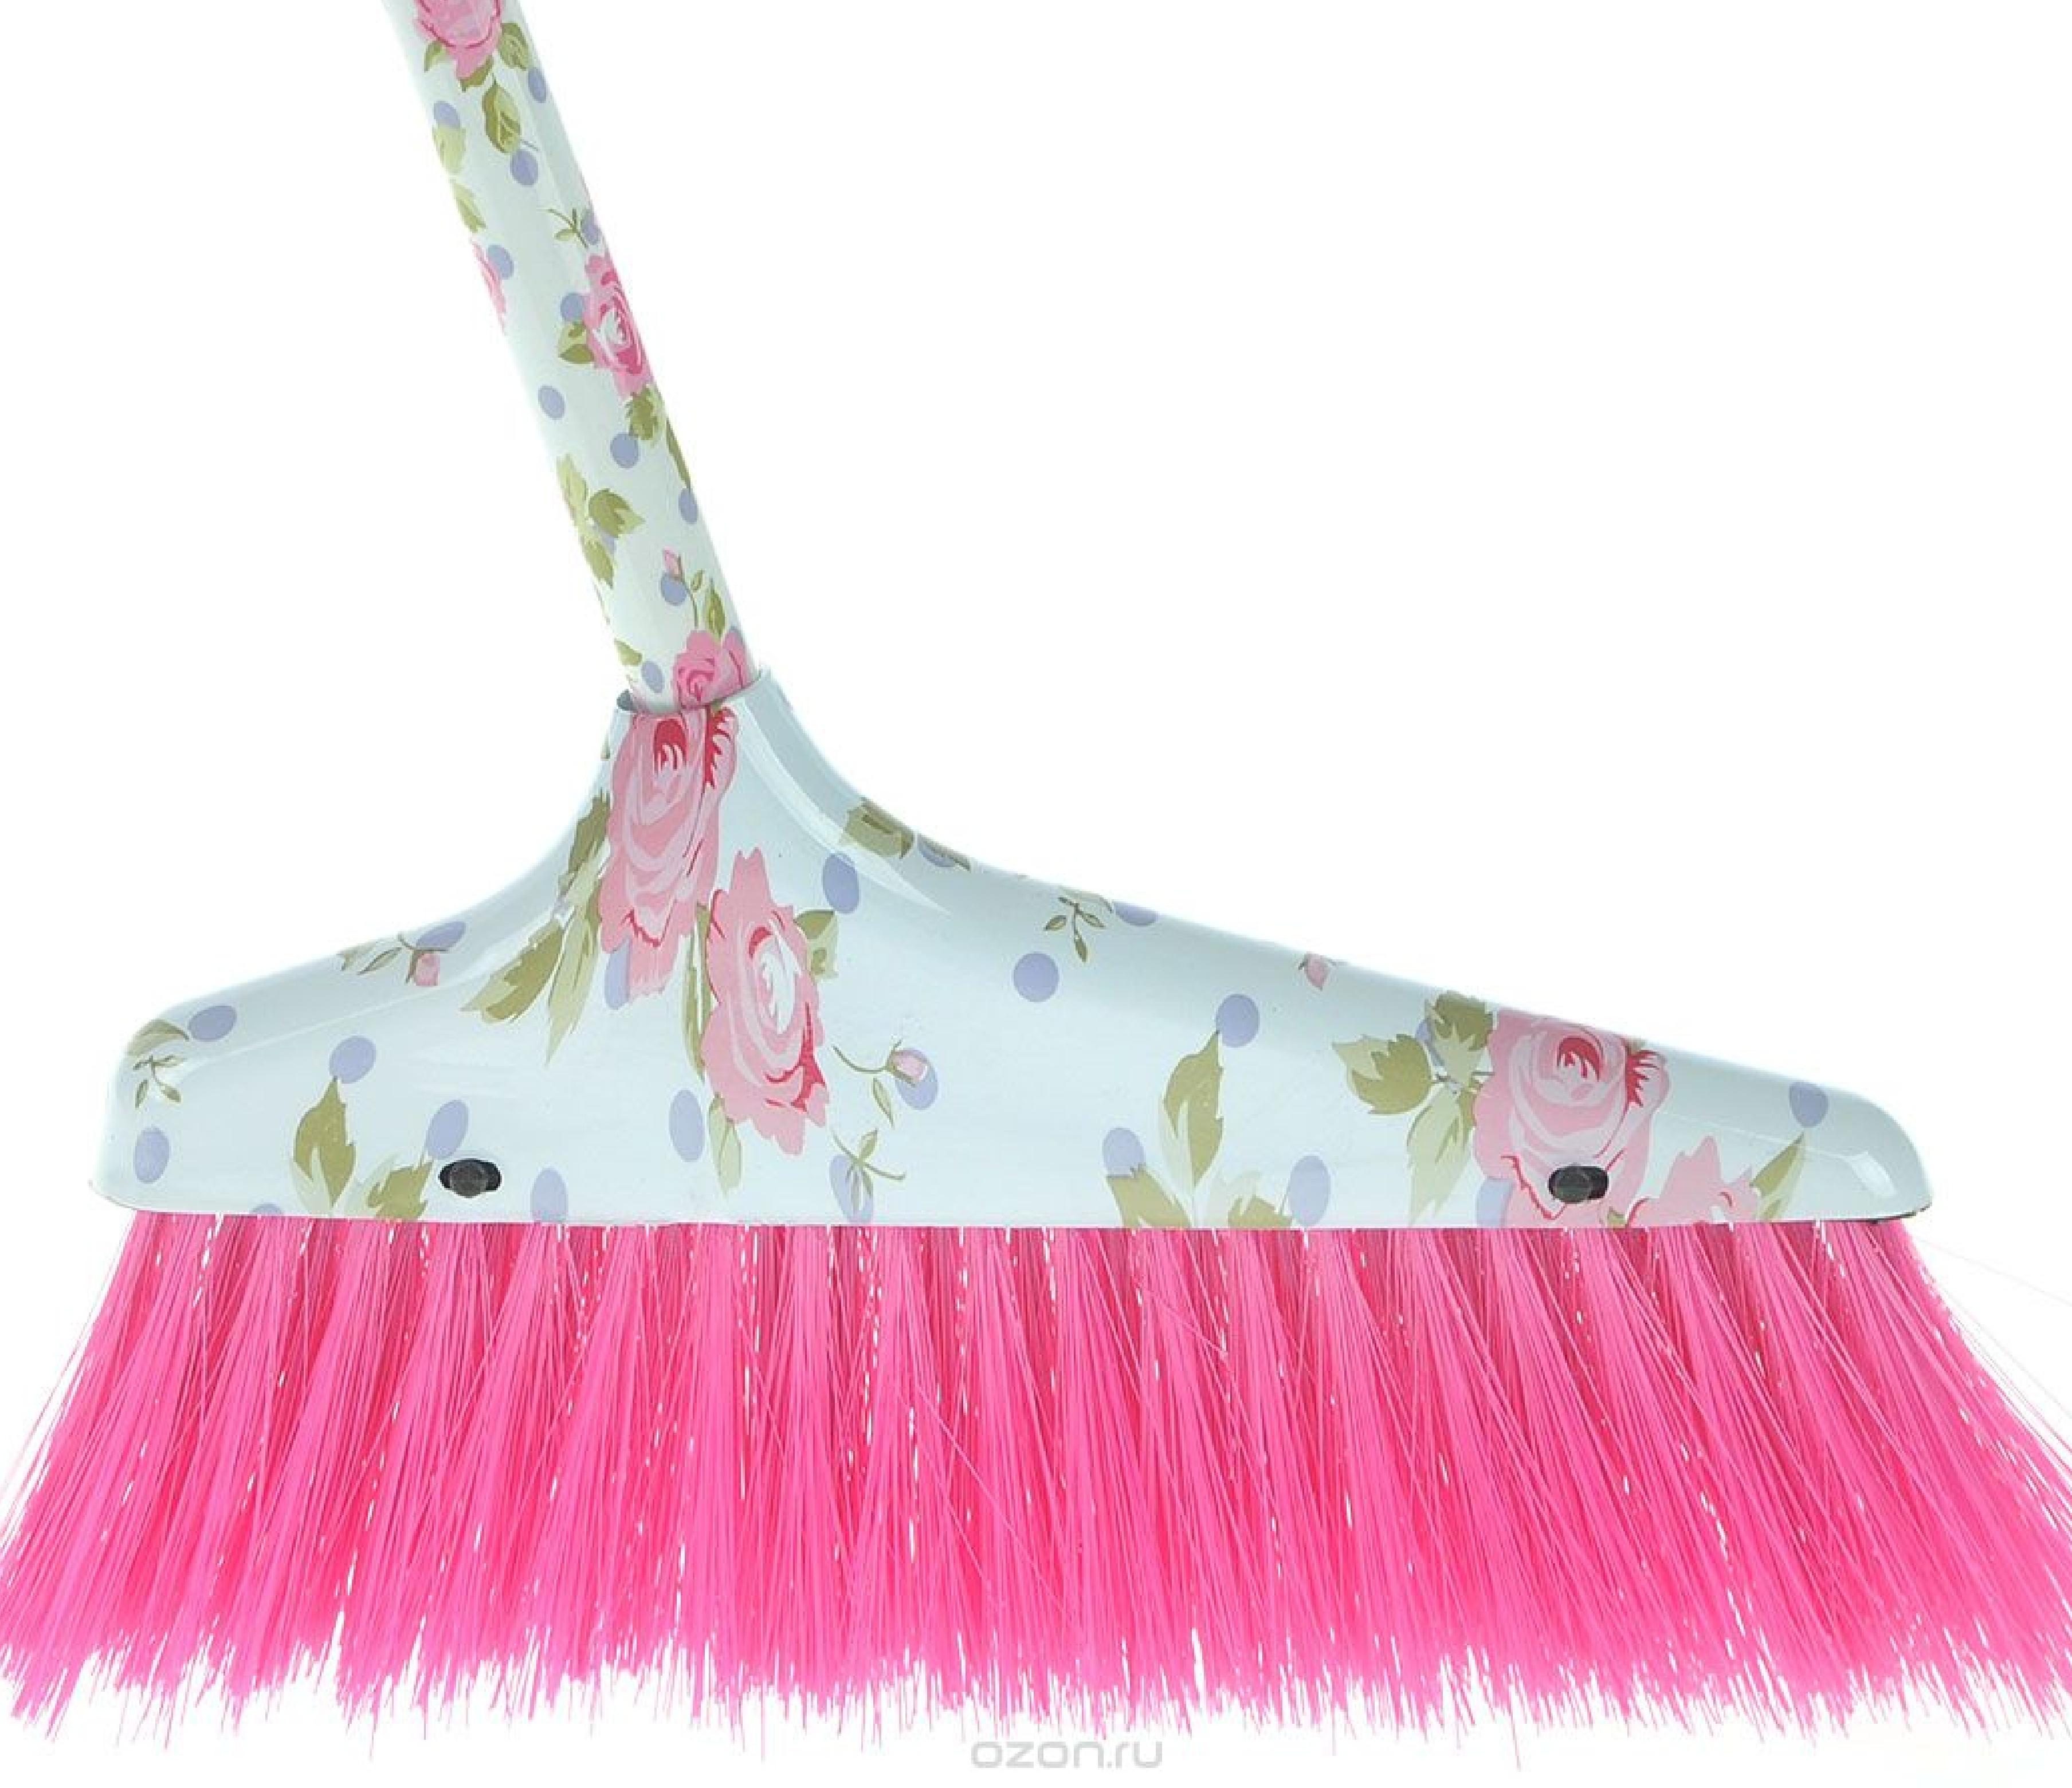 Набор для уборки You'll love Розы 2 предмета 70883